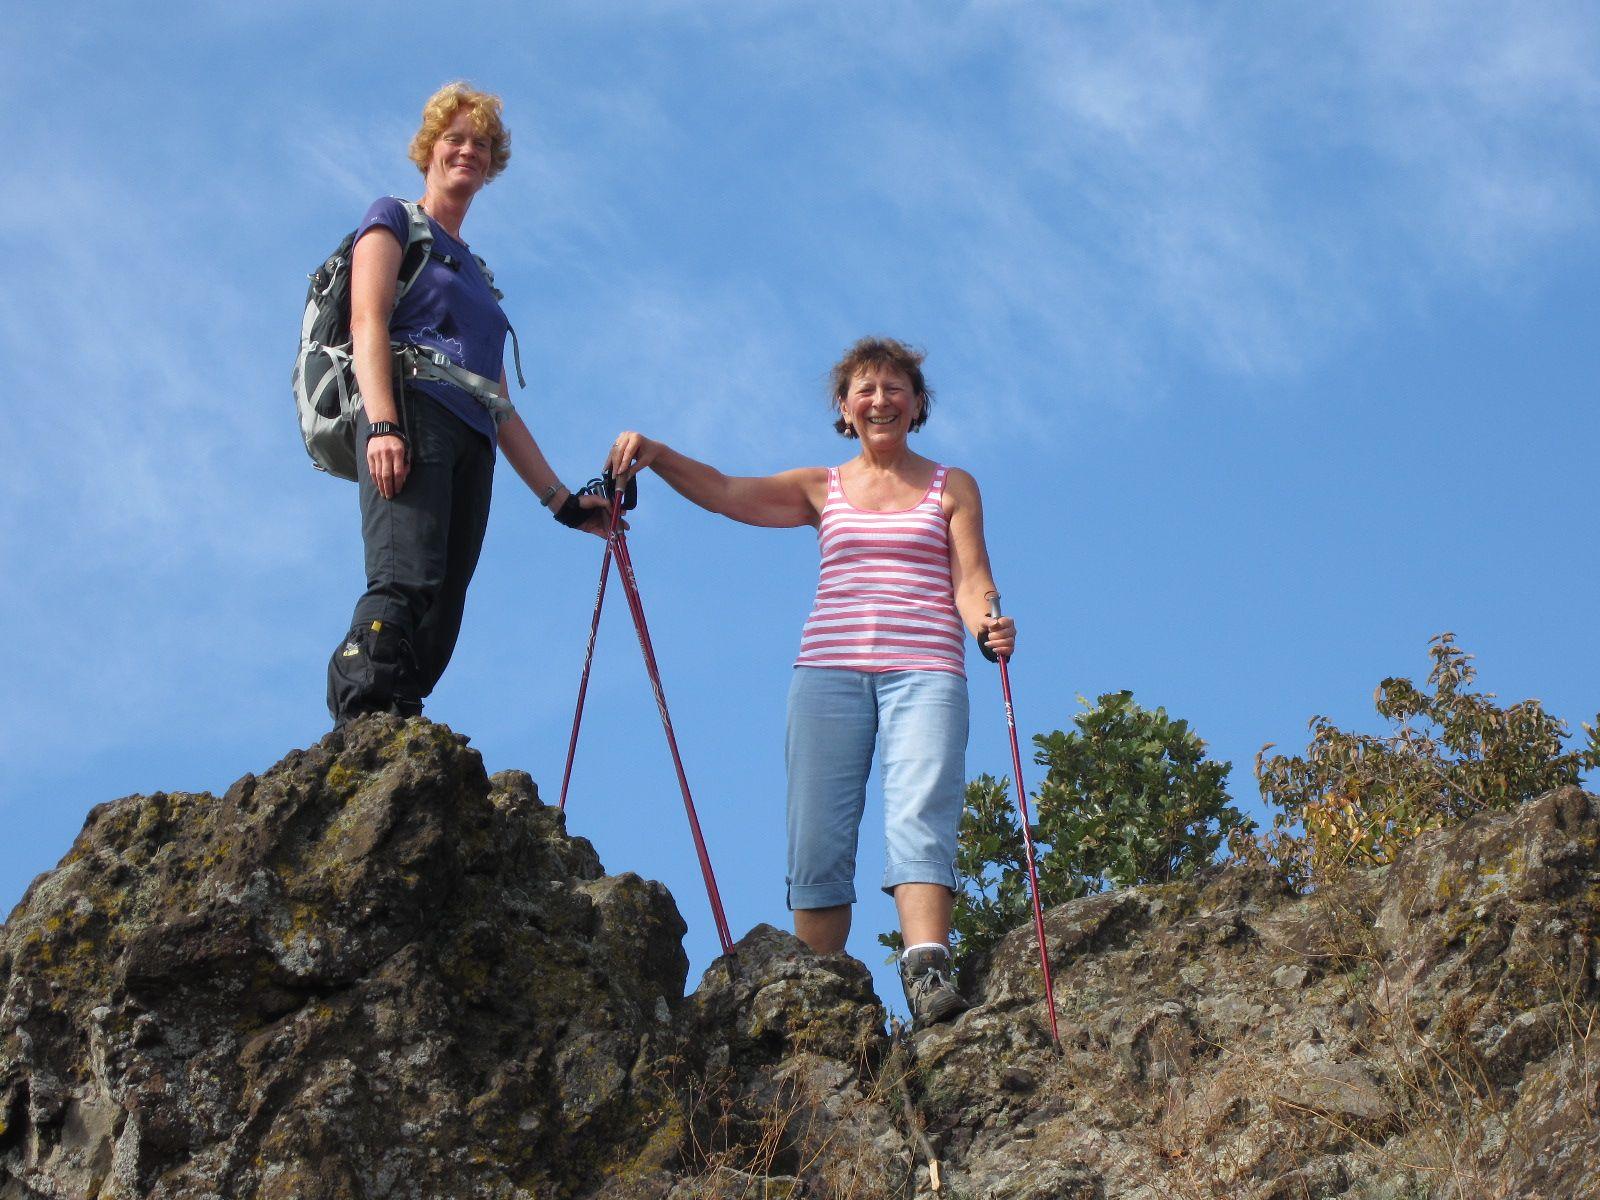 magas vérnyomás nordic walking magas vérnyomás hagyományos módszerek a magas vérnyomás kezelésére idős korban